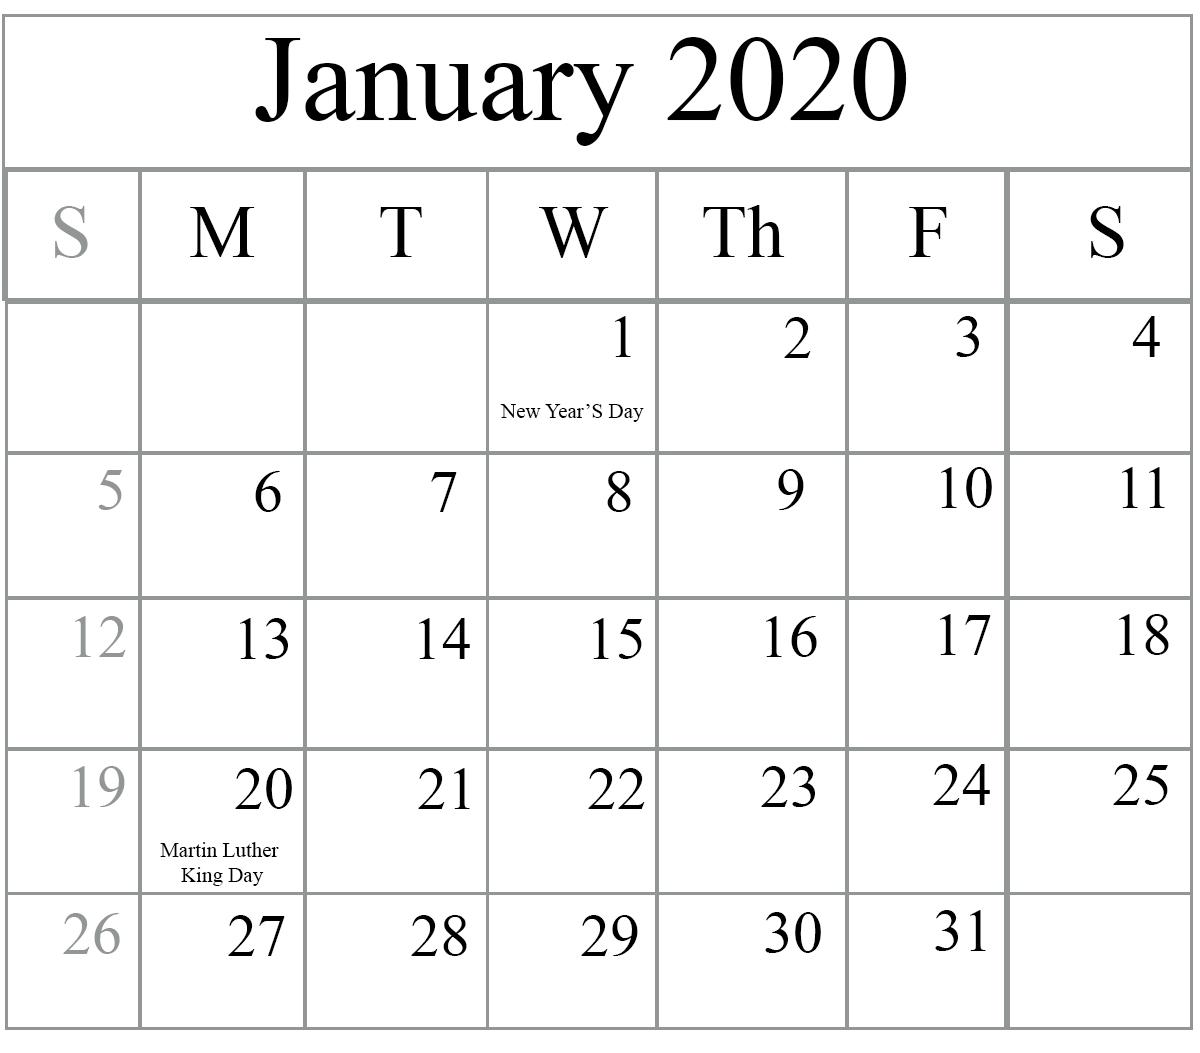 Free January 2020 Printable Calendar In Pdf, Excel & Word  Calendar To Write On 2020